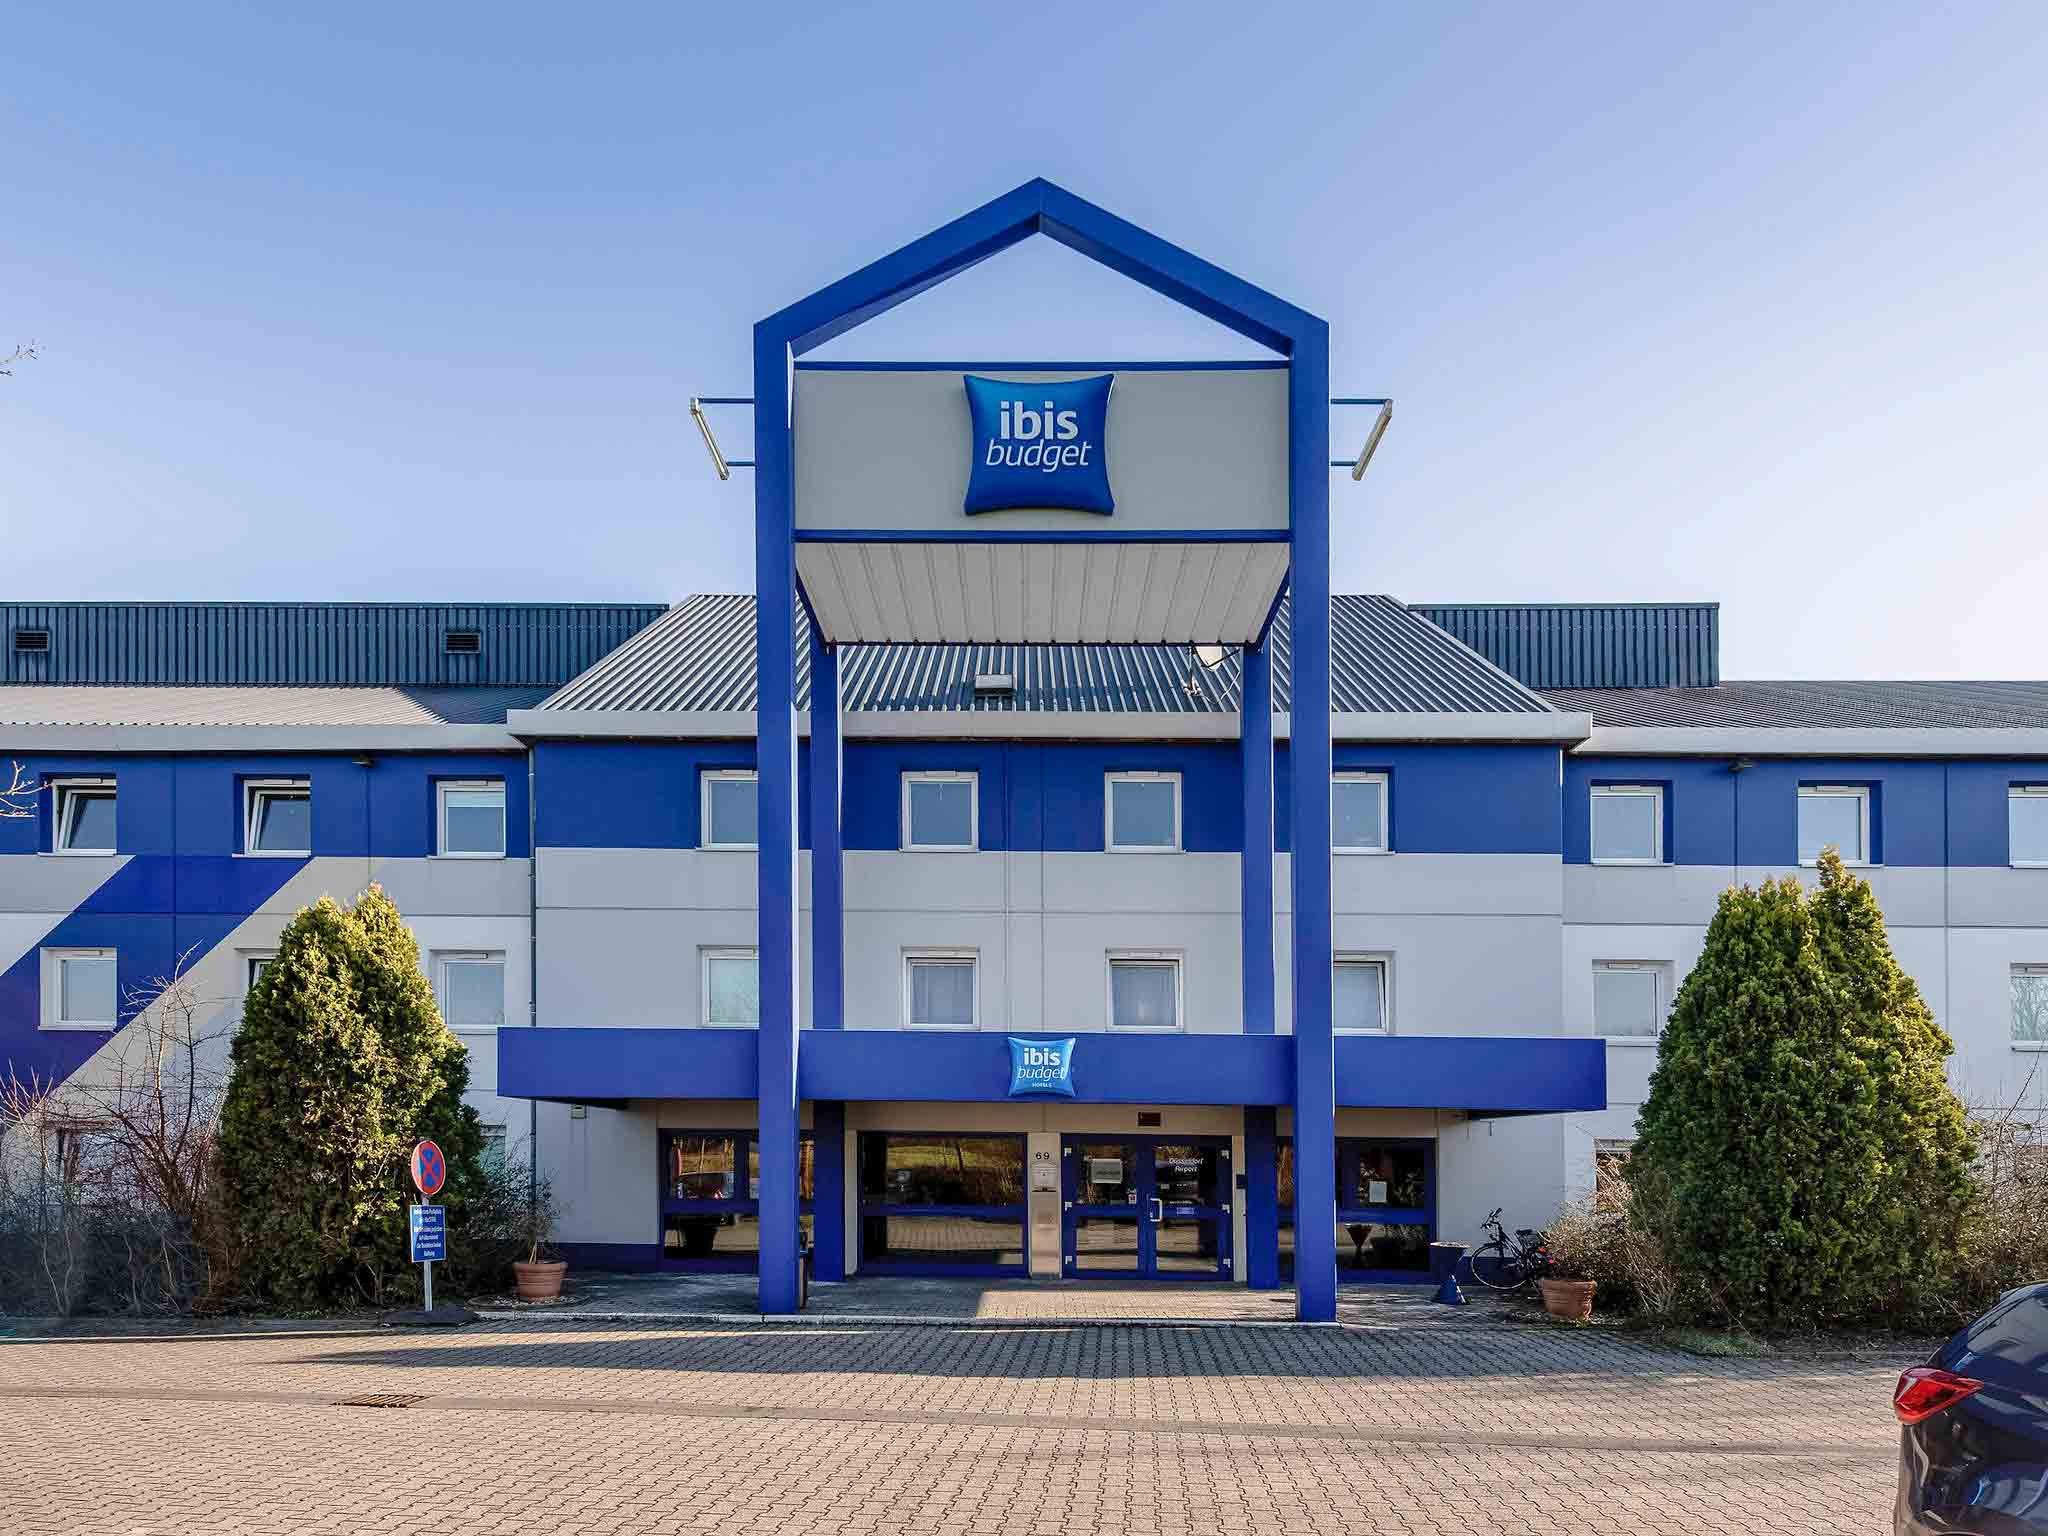 فندق - فندق إيبيس بدجت ibis budget دوسلدورف إيربورت